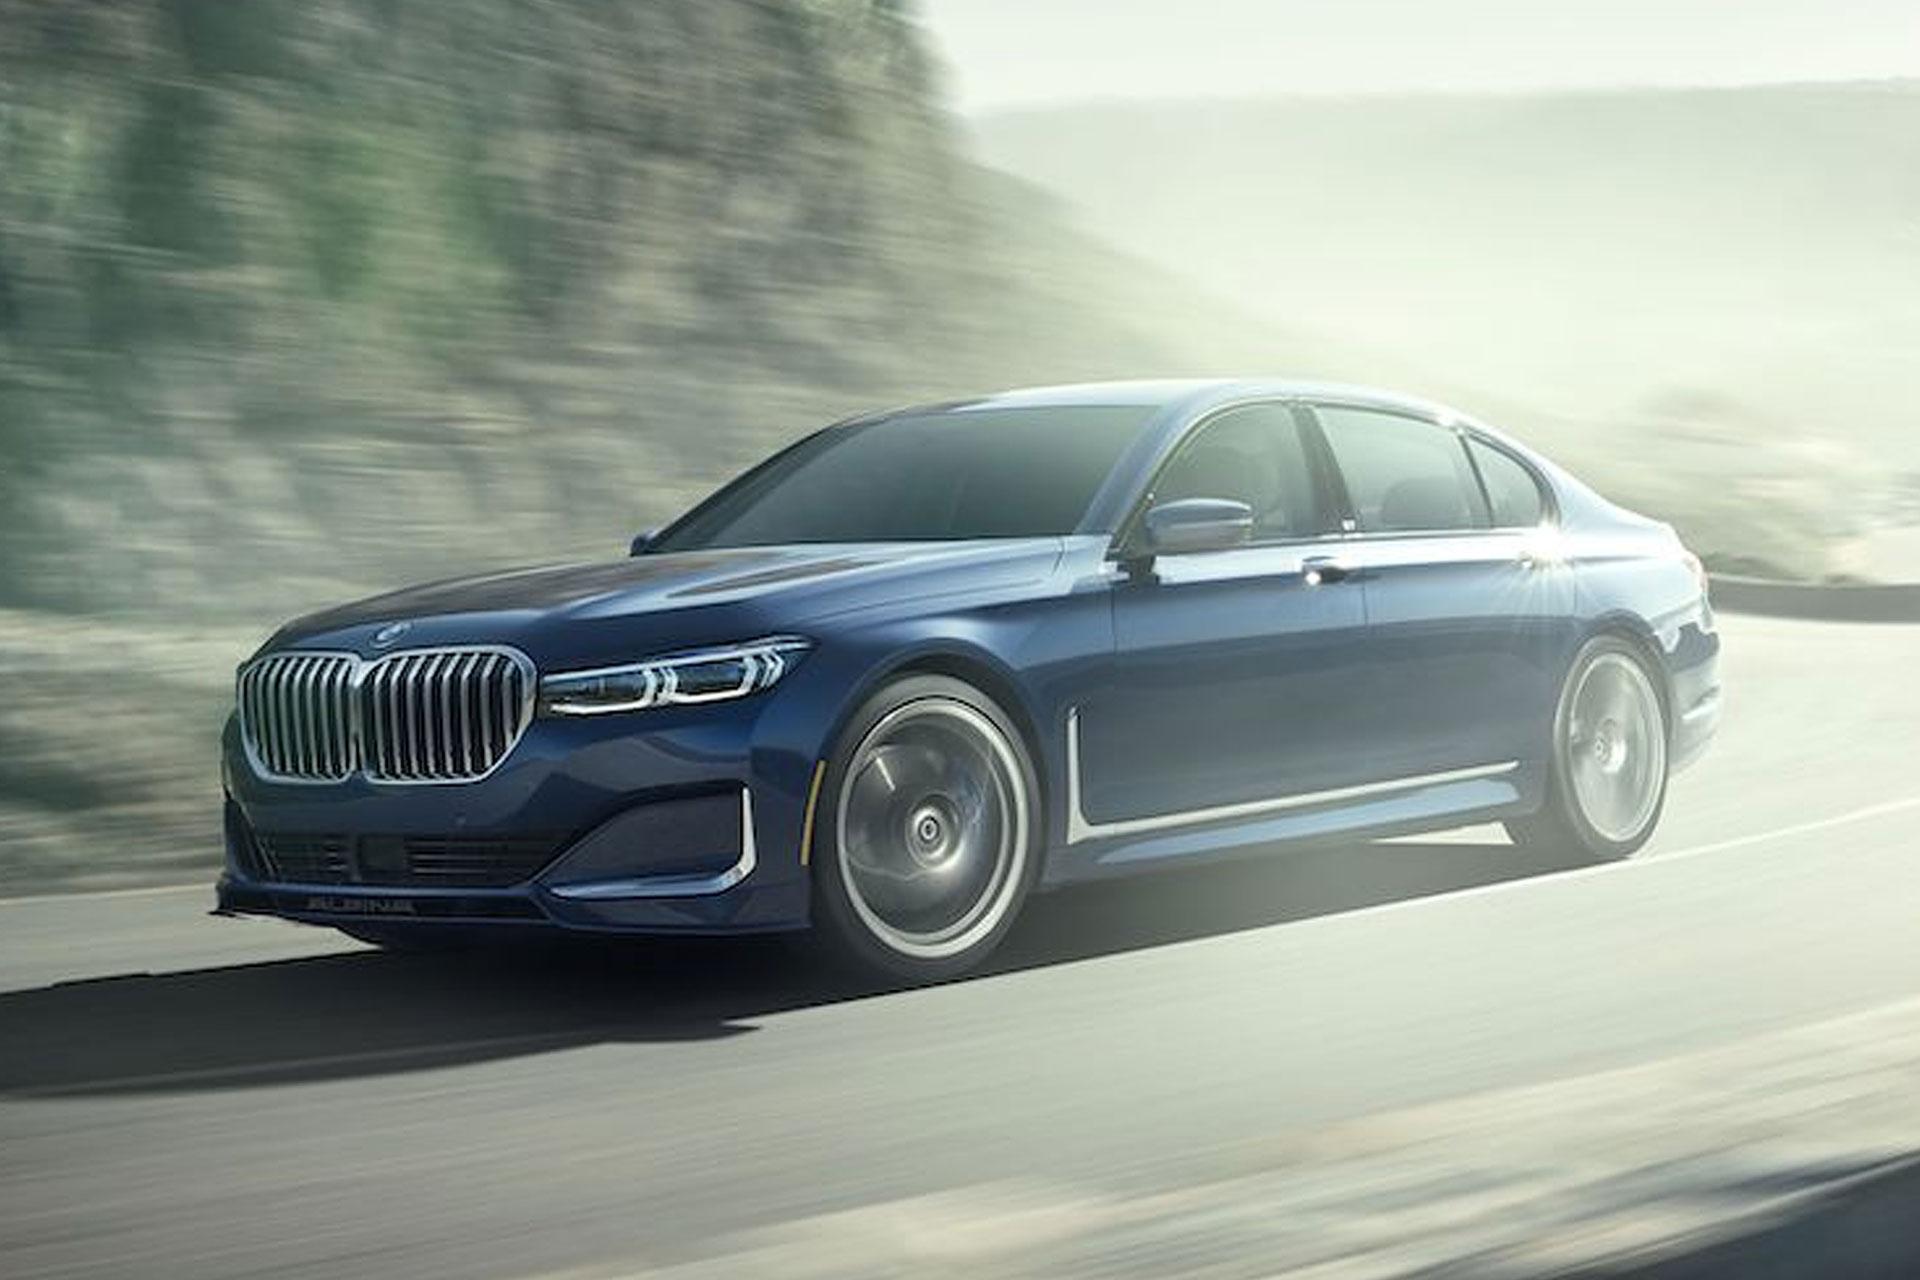 2019 BMW Alpina B7 Sedan | Uncrate